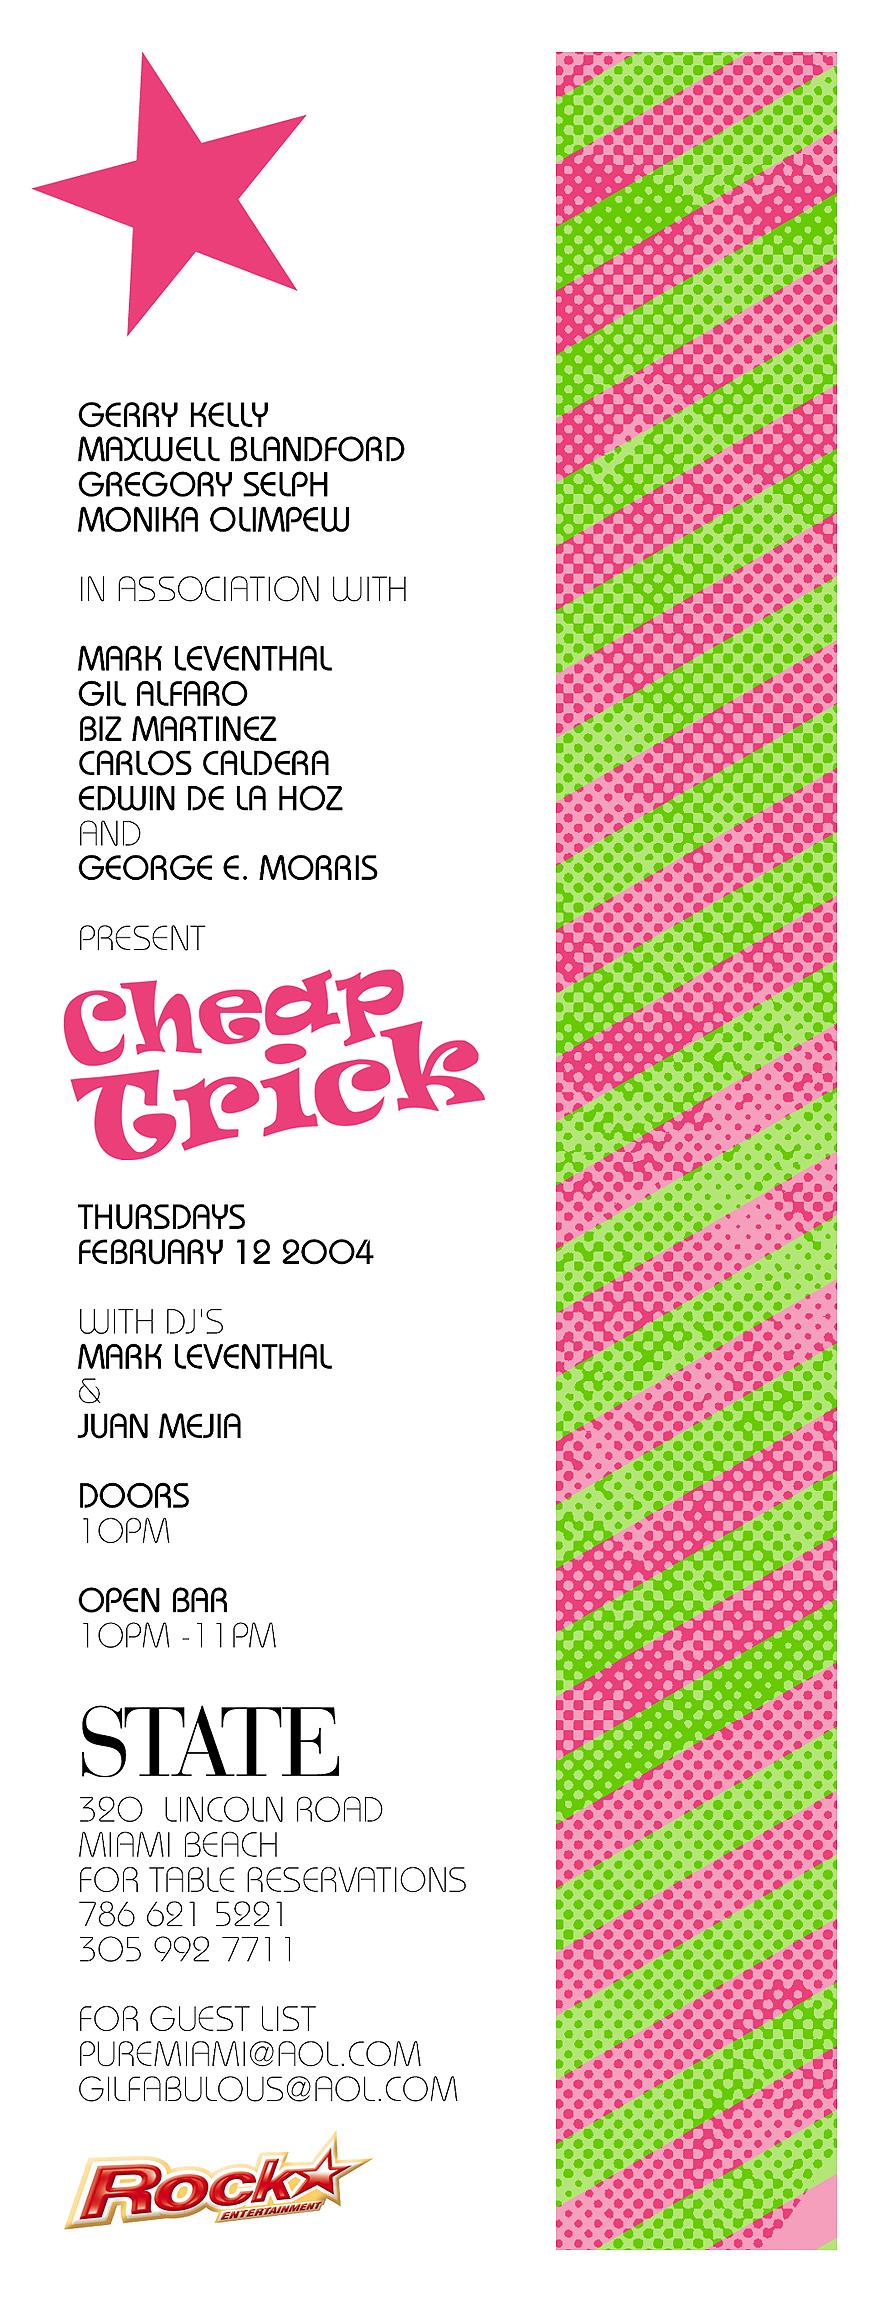 Cheap Trick Thursdays at State Nightclub